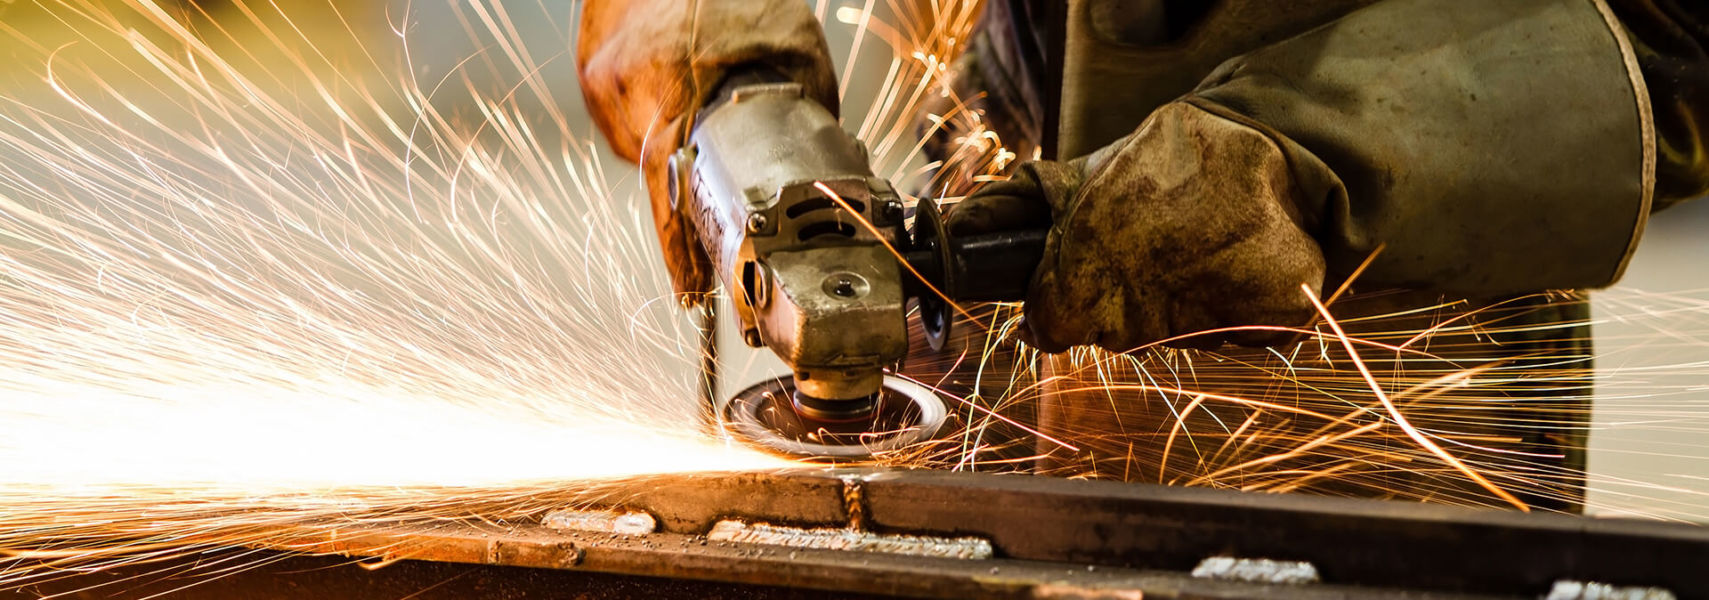 Manufacturing Header Image